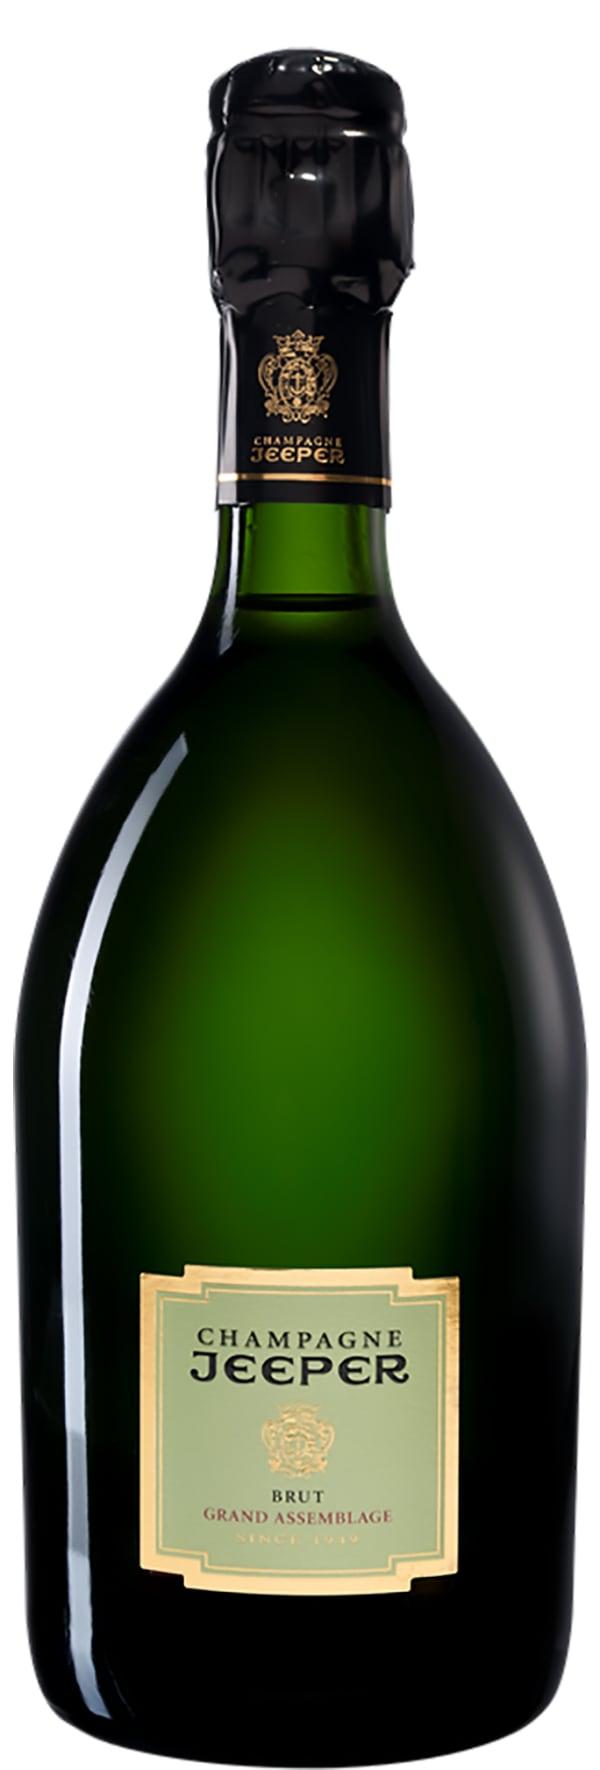 Jeeper Grand Assemblage Champagne Brut